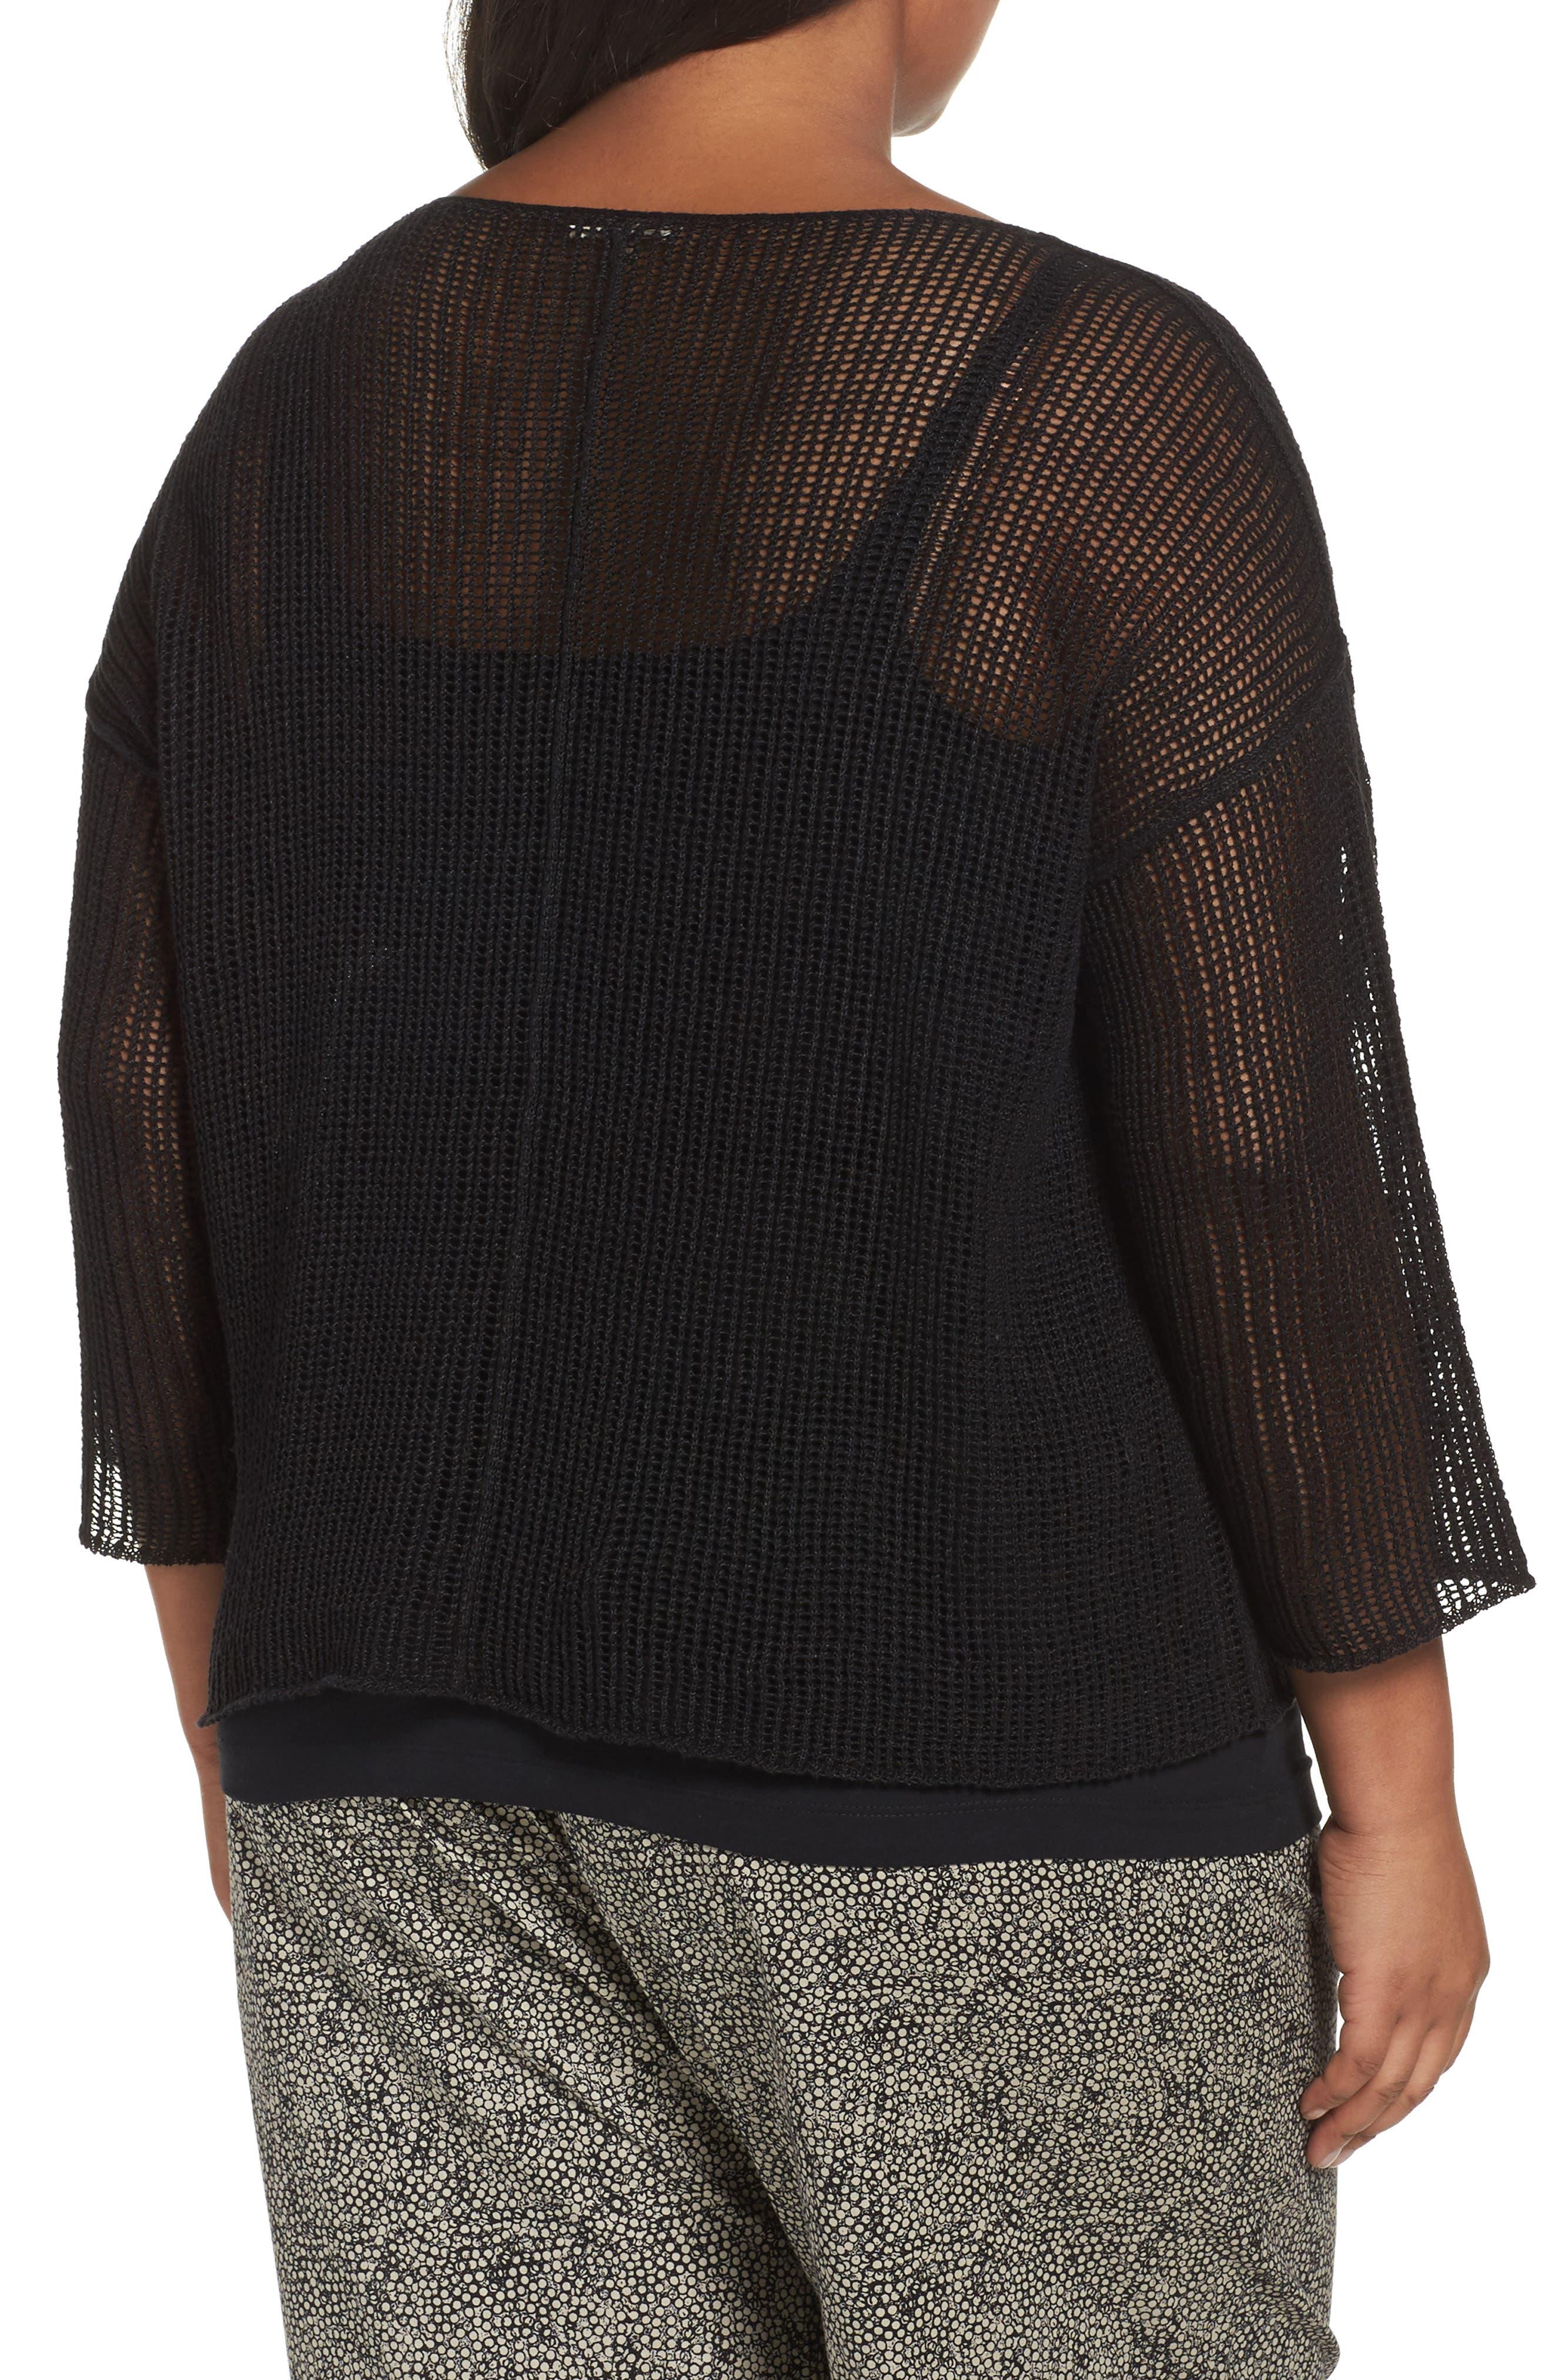 Organic Linen Mesh Knit Top,                             Alternate thumbnail 2, color,                             001